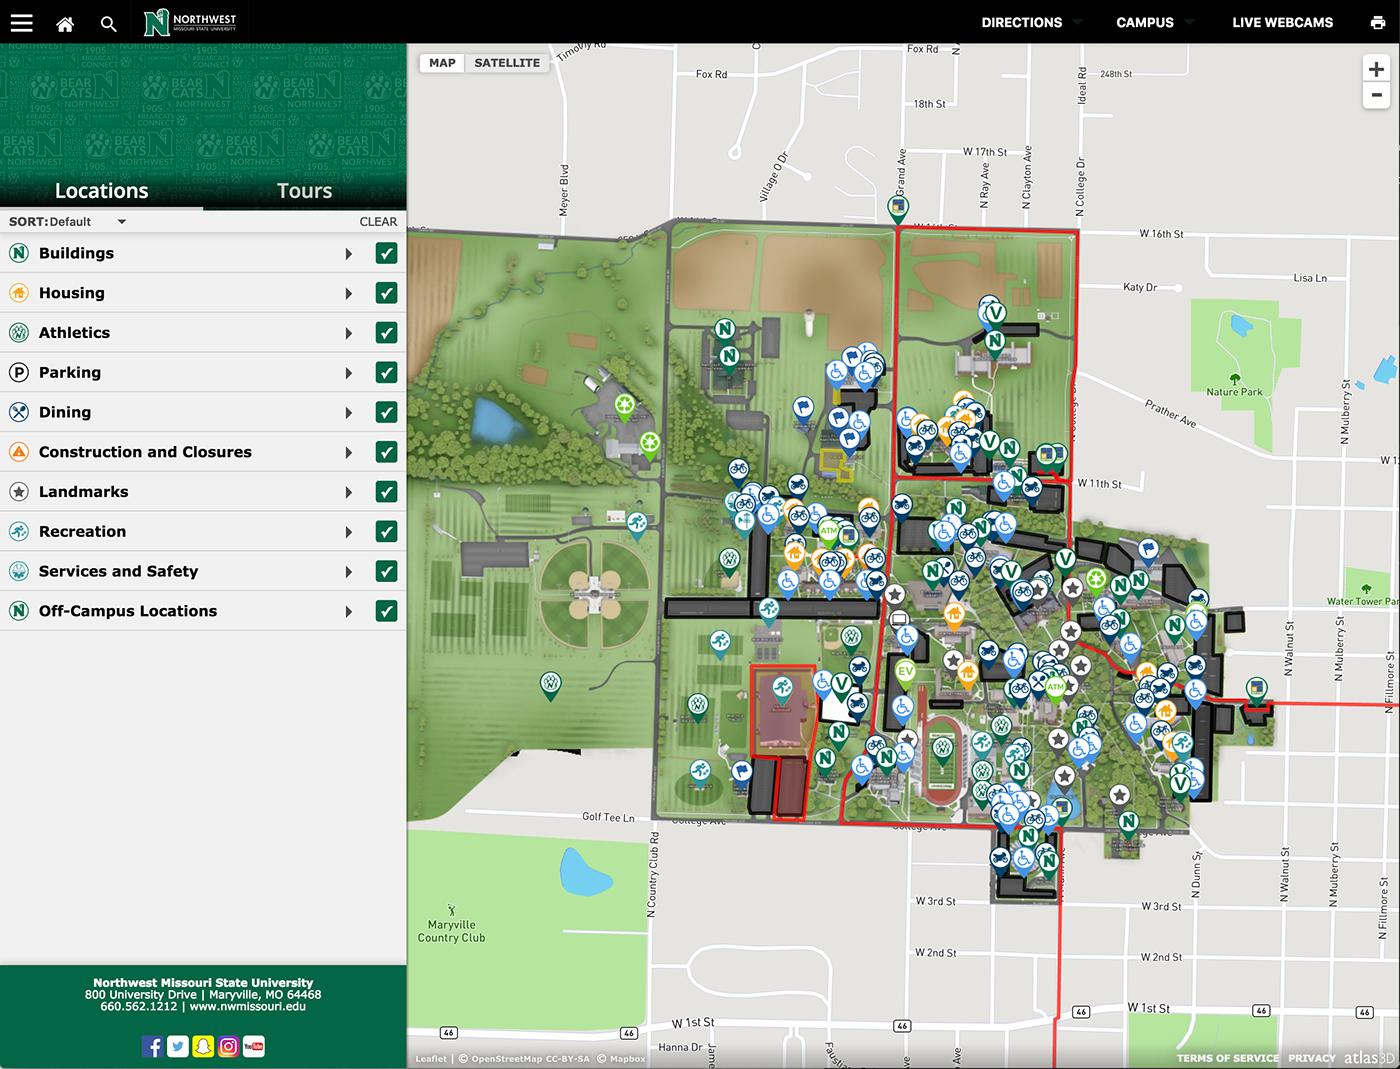 Northwest Missouri State University - Campus Map on Behance